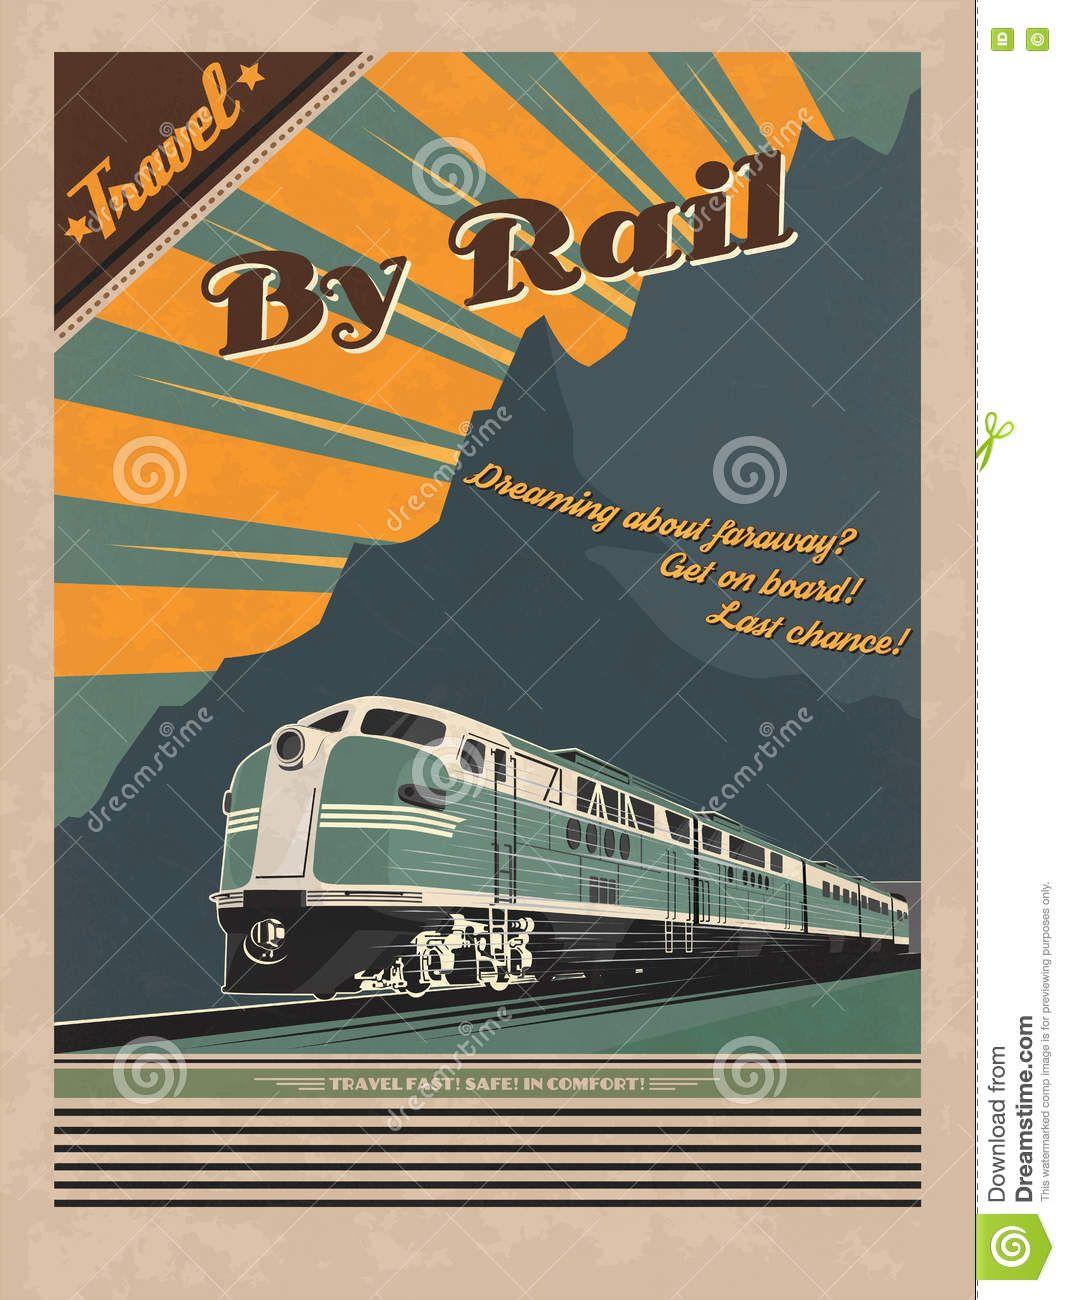 train clipart free - Google Search | Train cartoon, Train illustration,  Train drawing